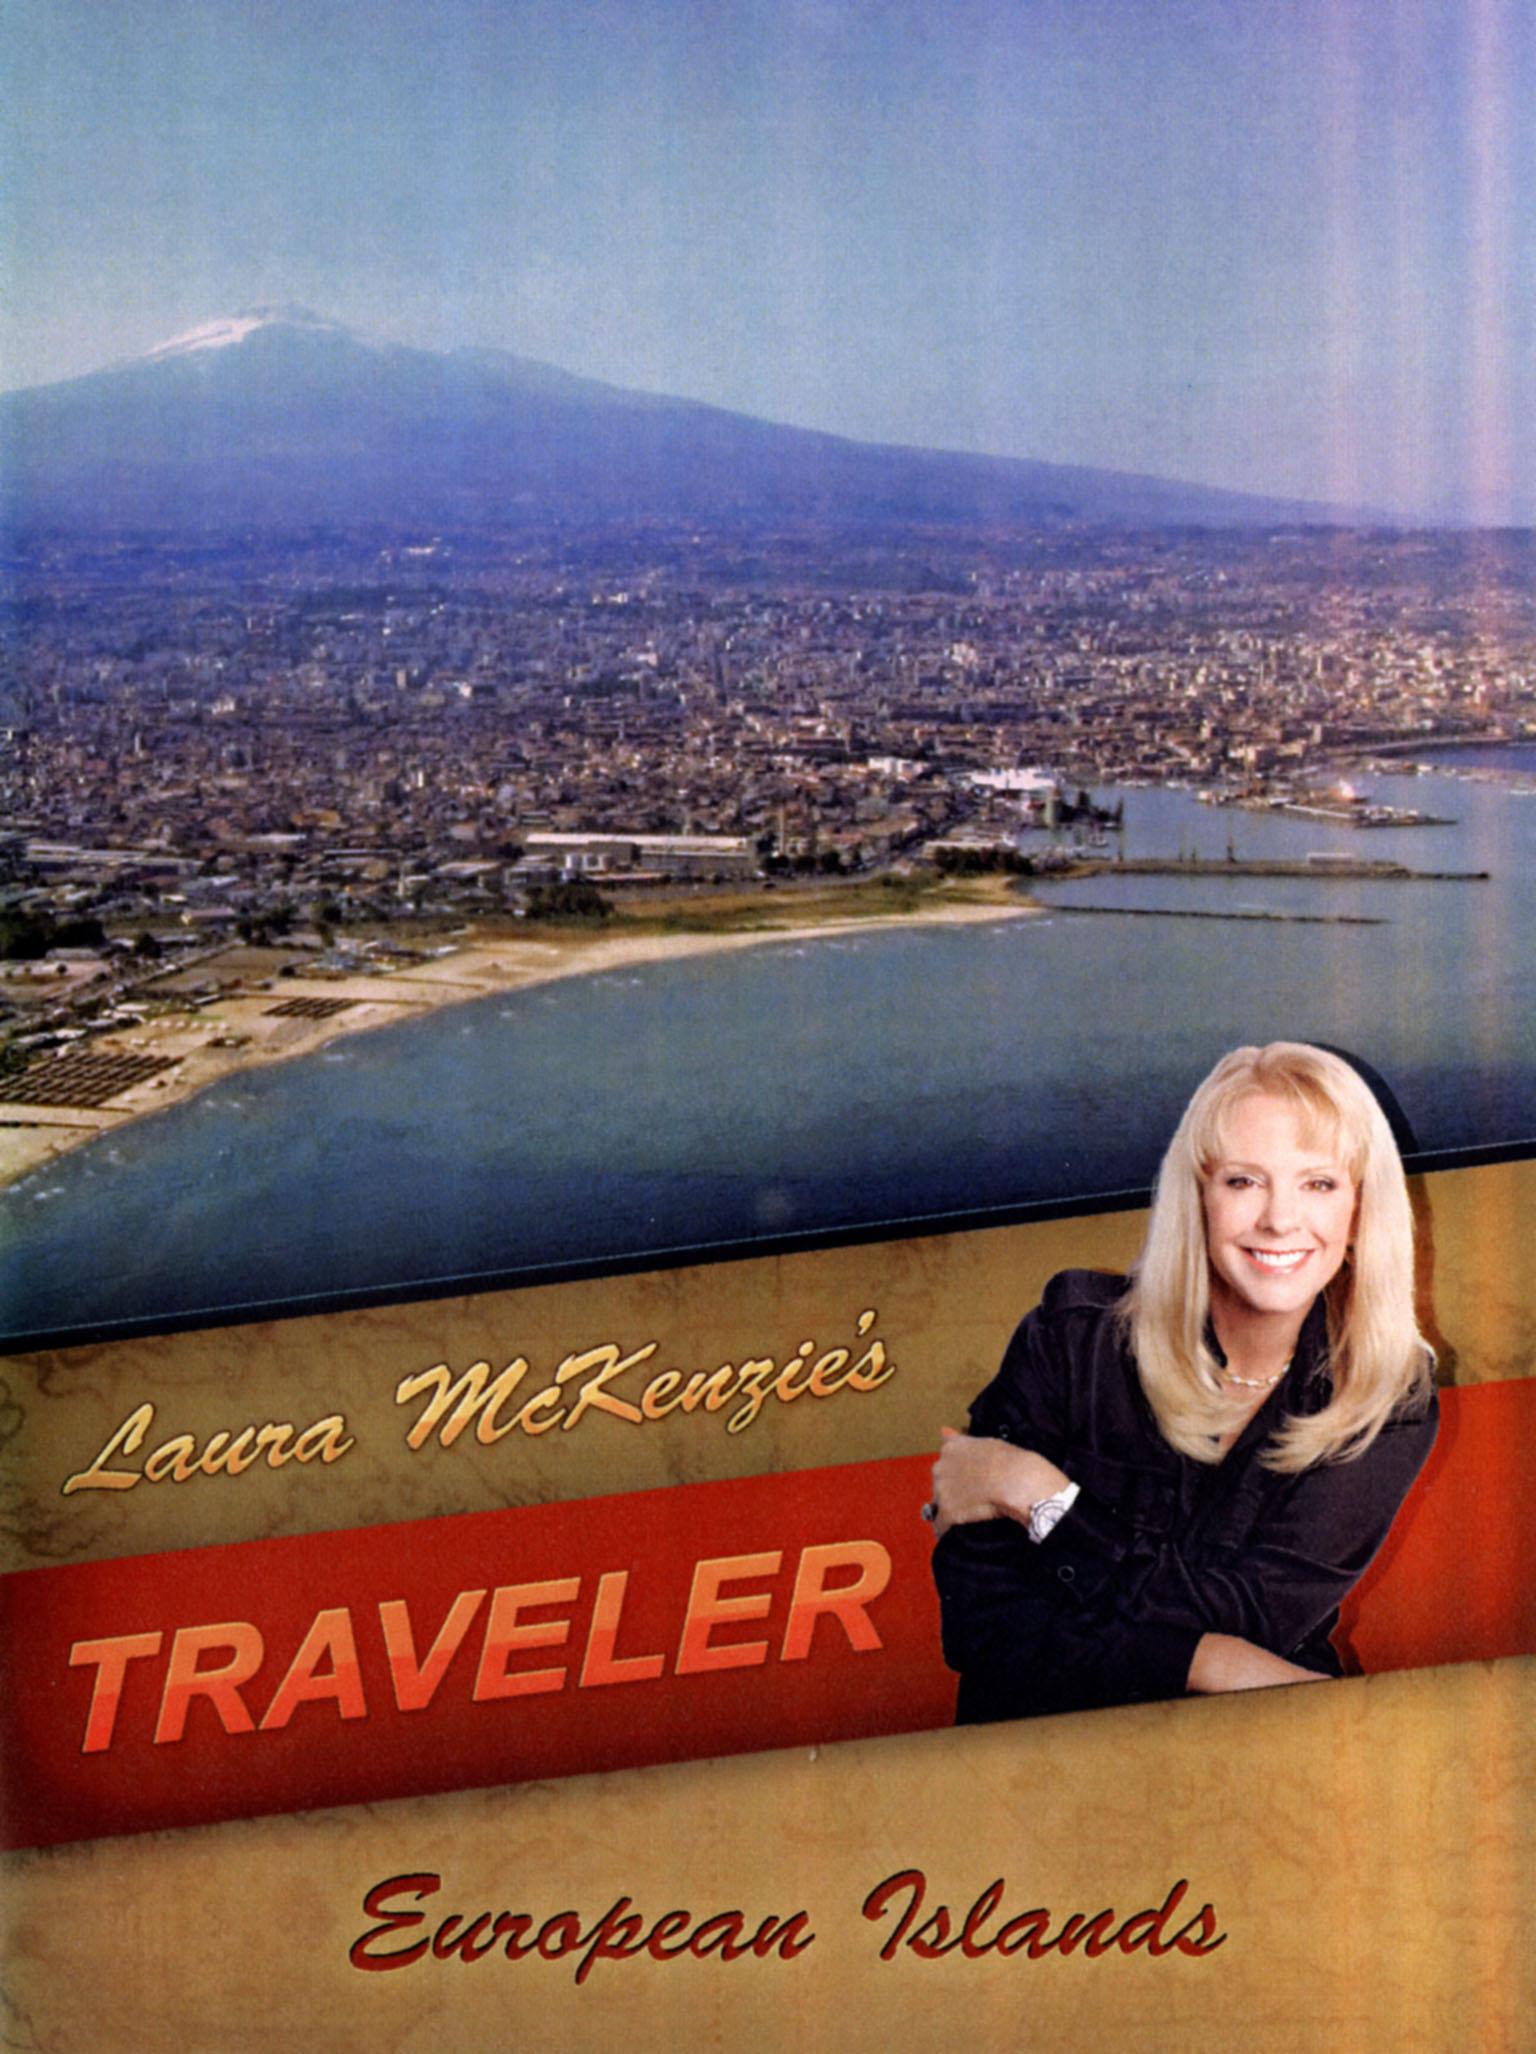 Laura McKenzie's Traveler: European Islands